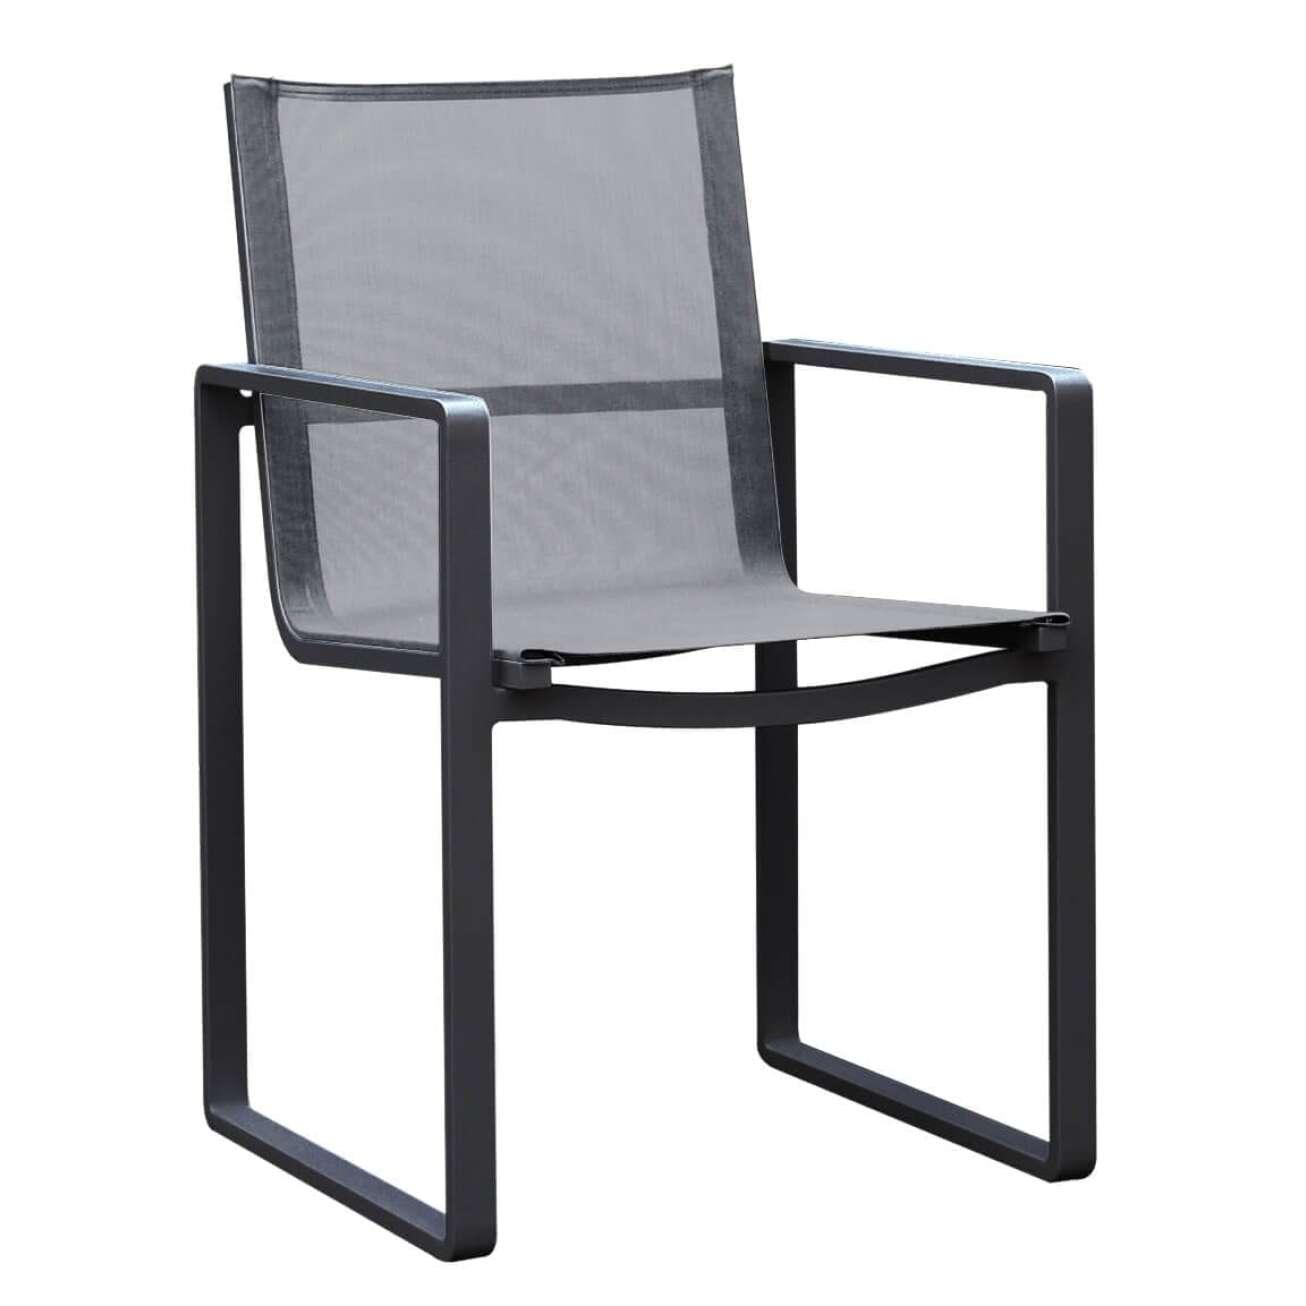 Sort stol med armlene, i aluminium med grå tekstil